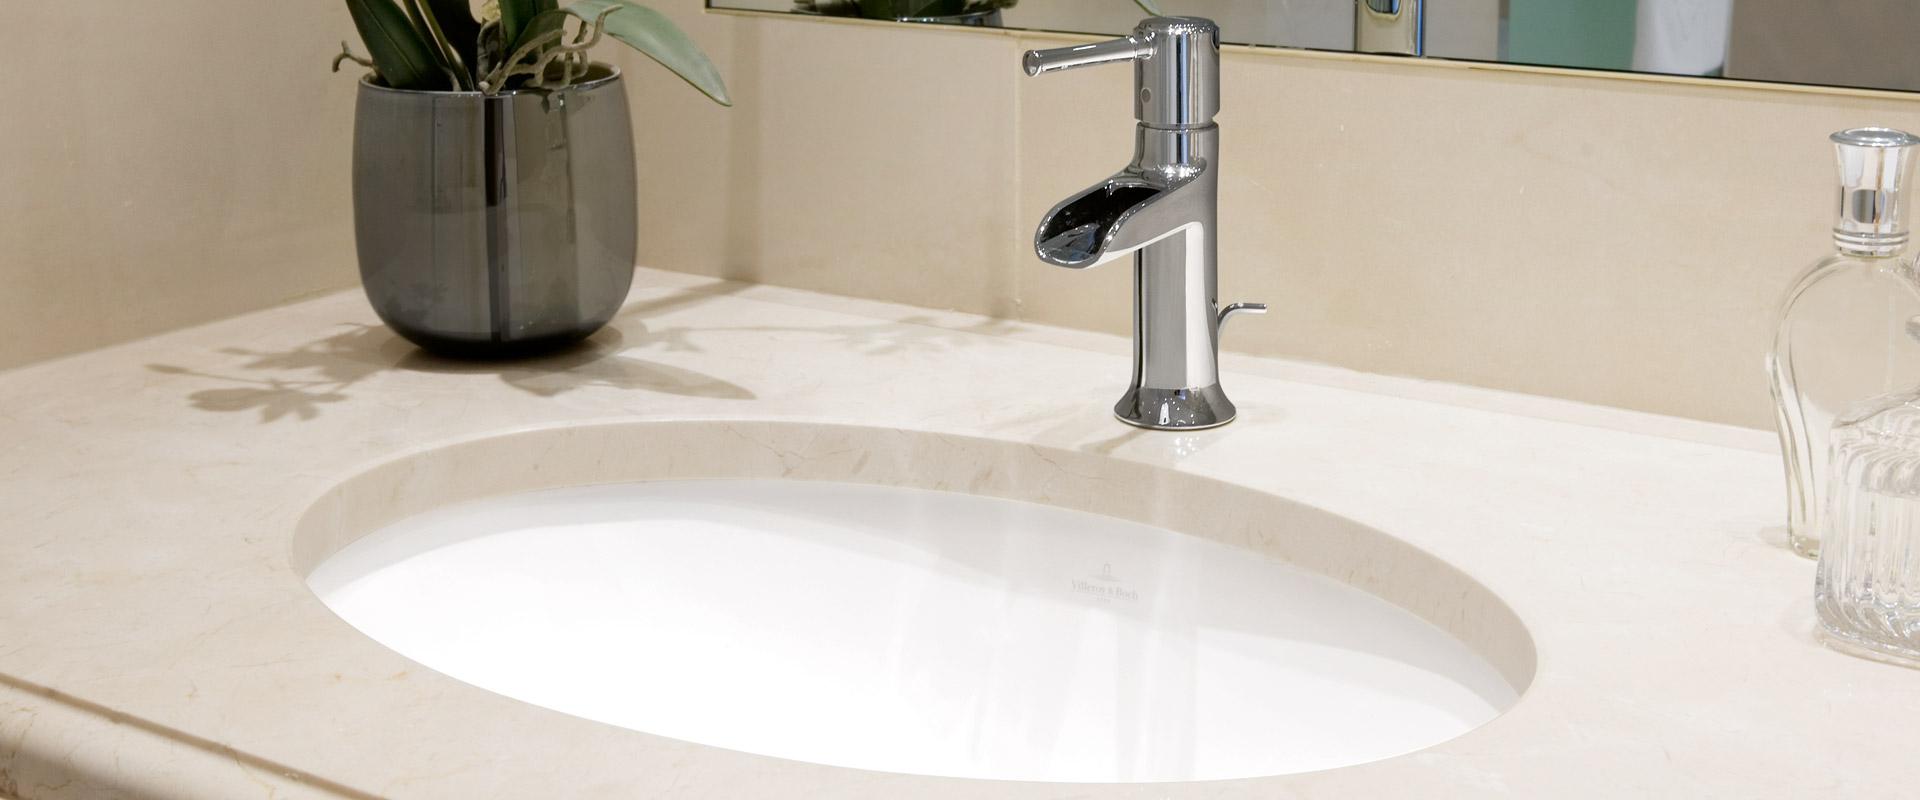 Villeroy and boch bathroom sinks bathroom sinks ce3f96d2da - Villeroy and boch bathroom cabinets ...